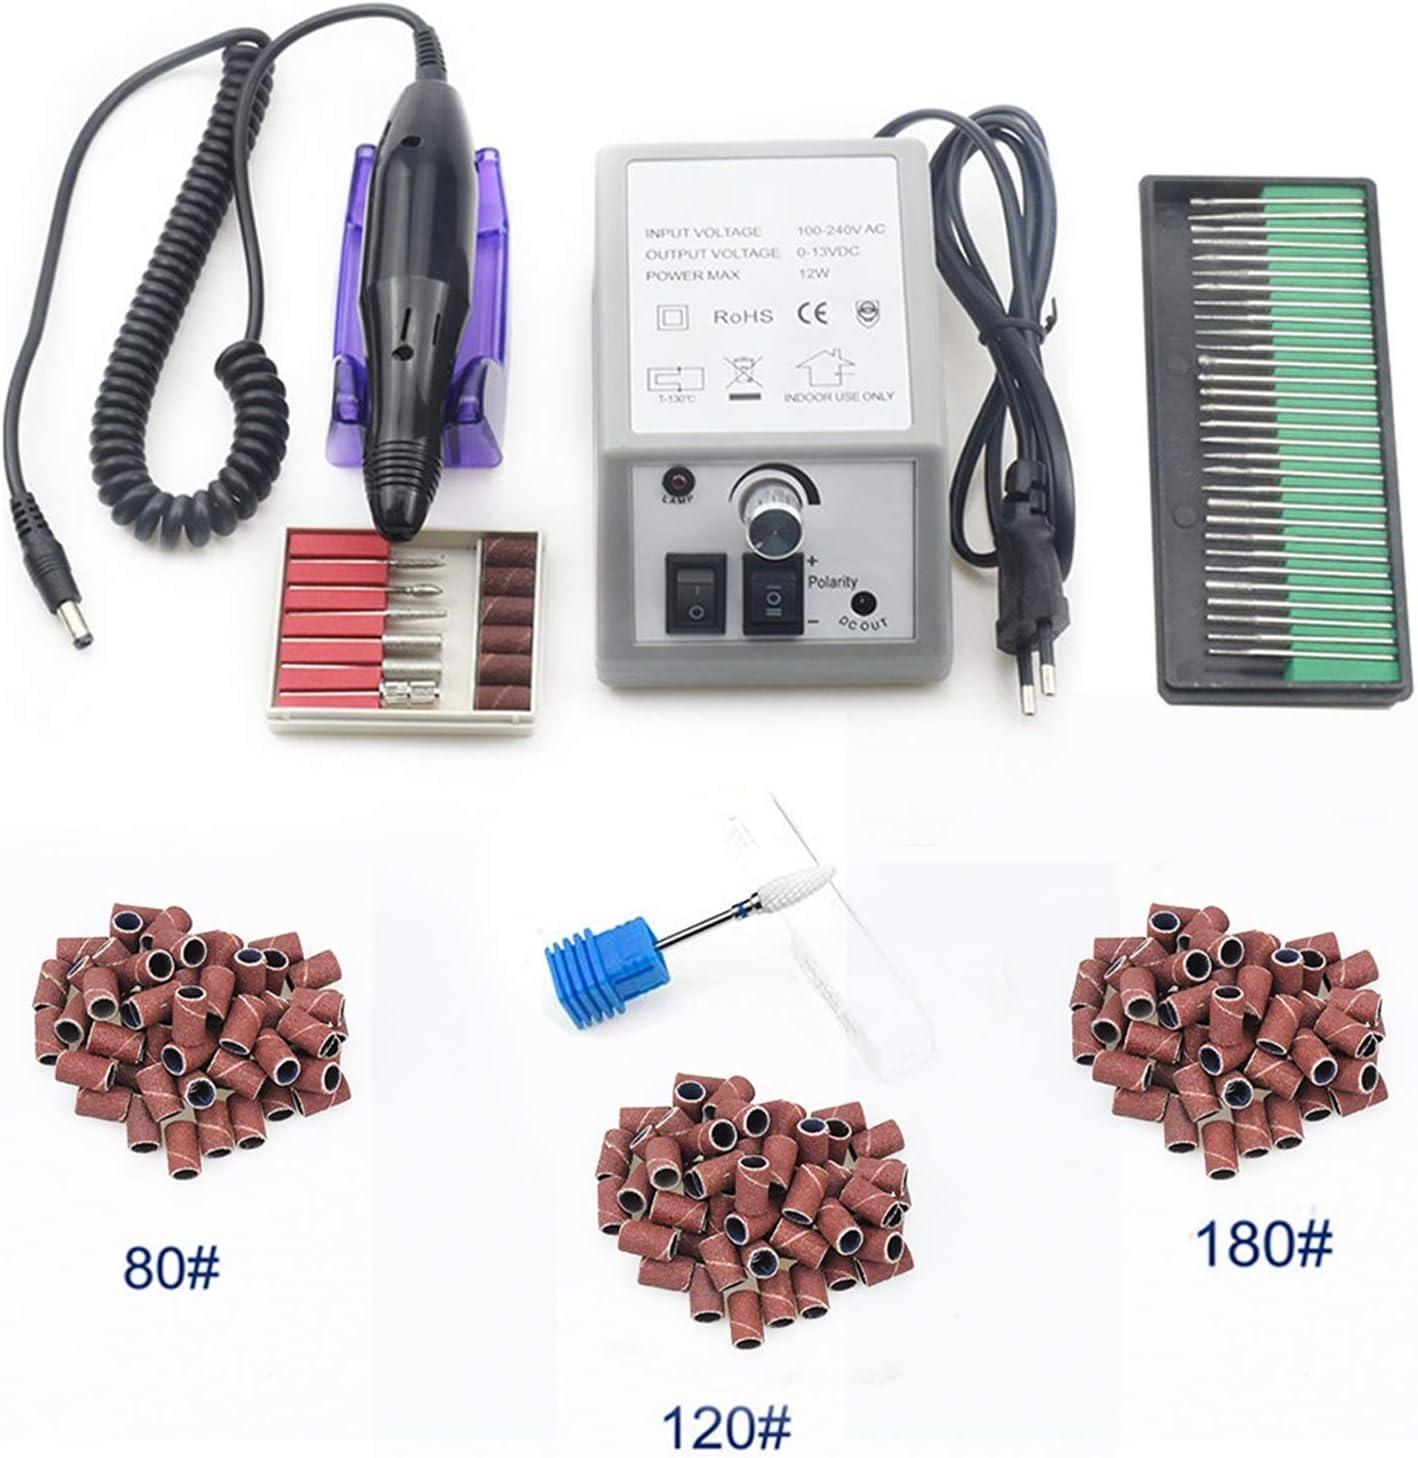 ZRNG 35000/20000 RPM Máquina de Taladro de Esmalte de uñas Manicure Electronic Nail File Drill Manicure Pedicure Kit Equipo de Arte de uñas (Color : 20000 1)